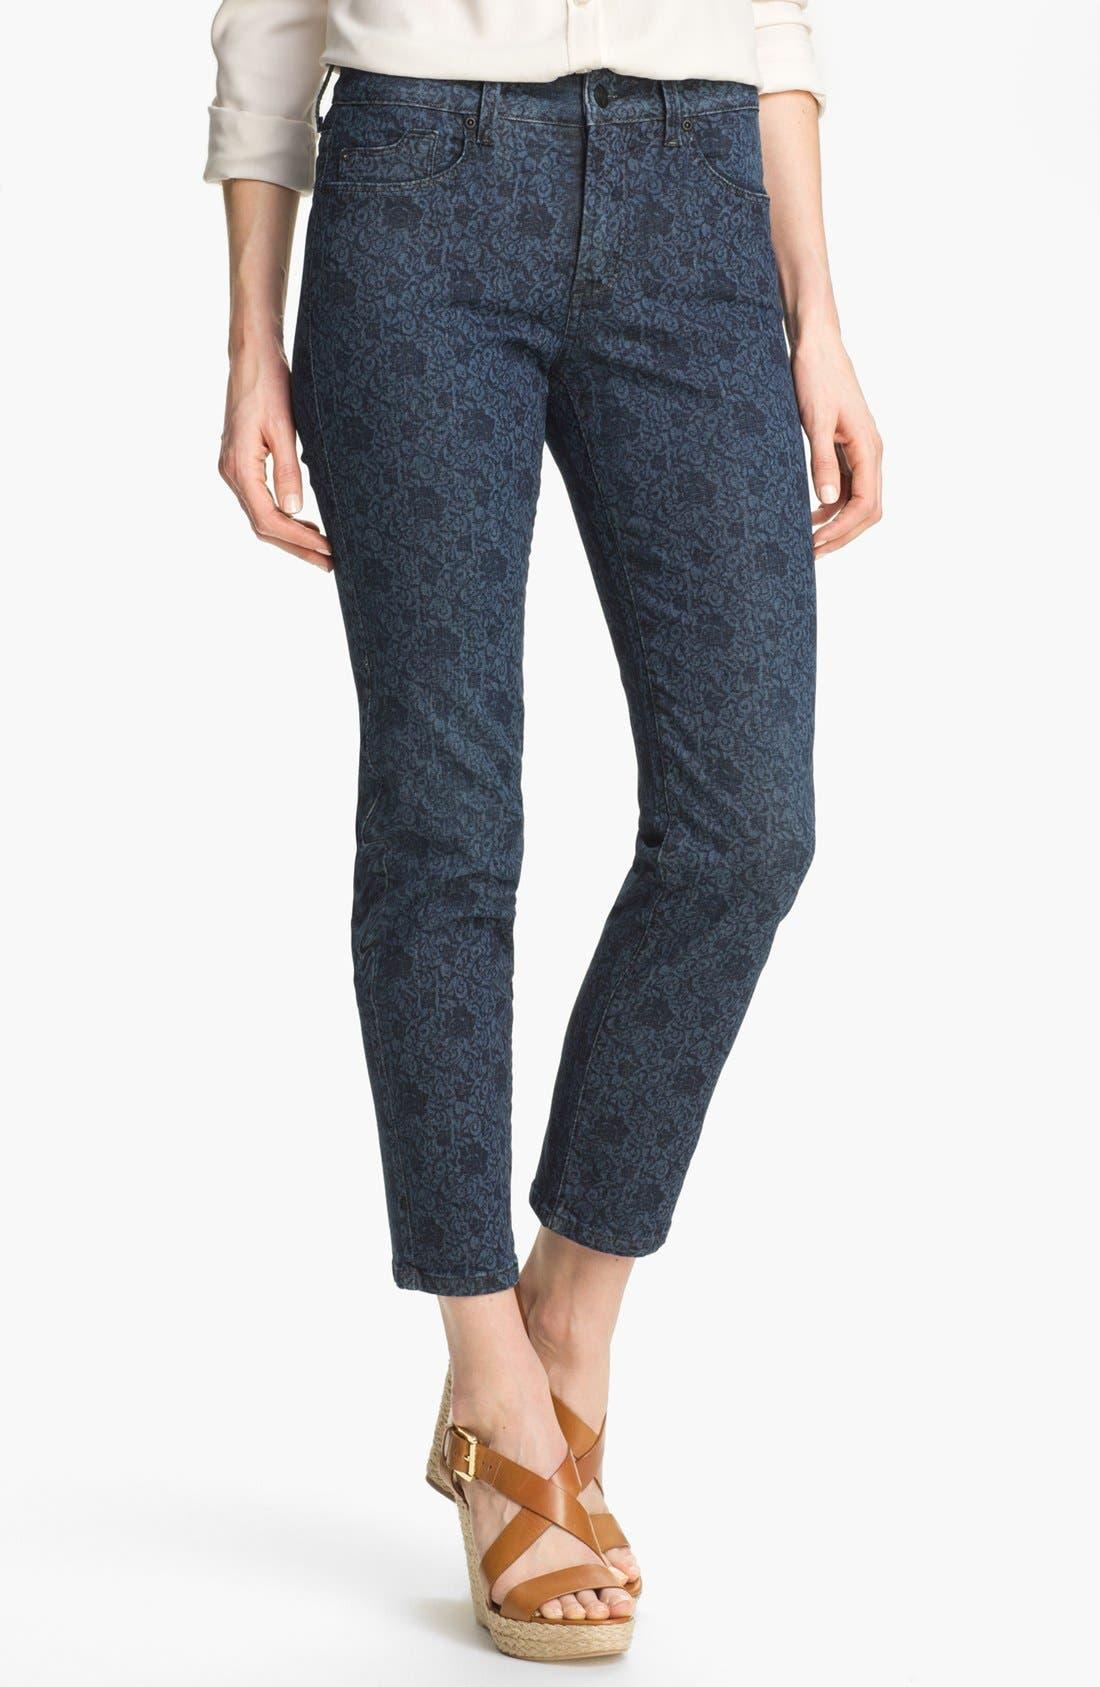 Main Image - NYDJ 'Alisha' Print Stretch Ankle Skinny Jeans (Petite)